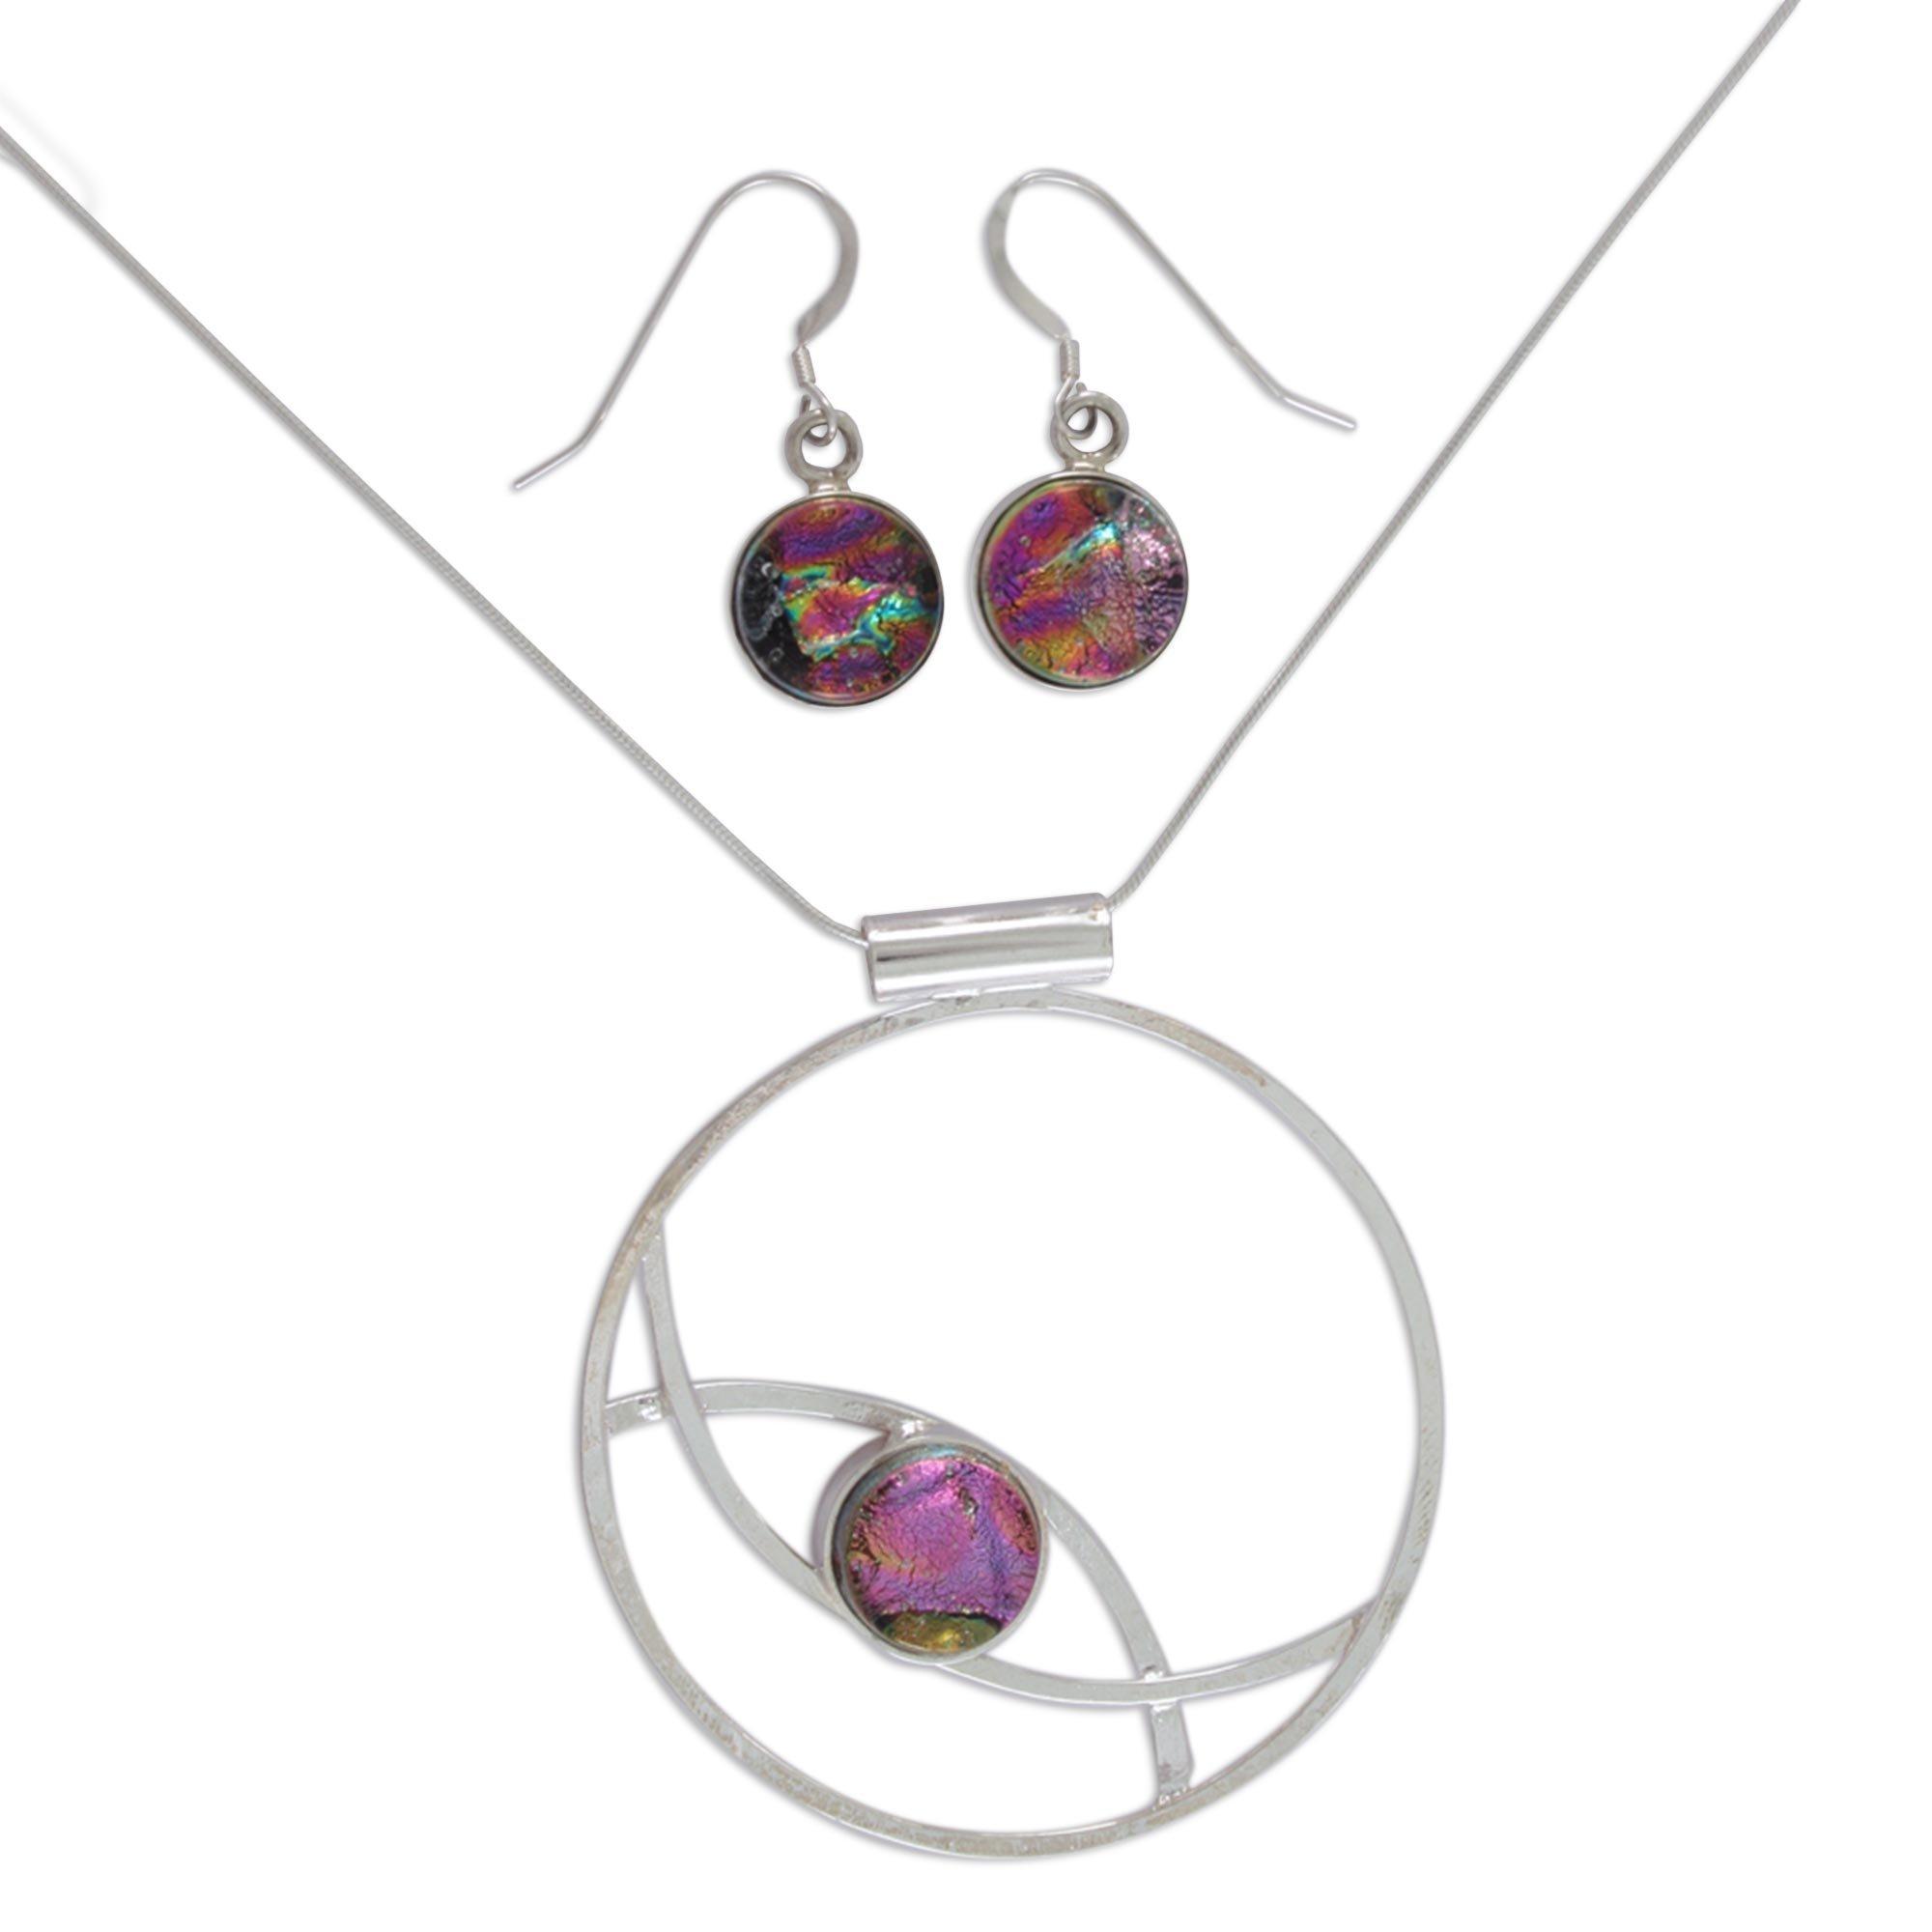 NOVICA .925 Sterling Silver Glass Jewelry Set 'Infinite Color'